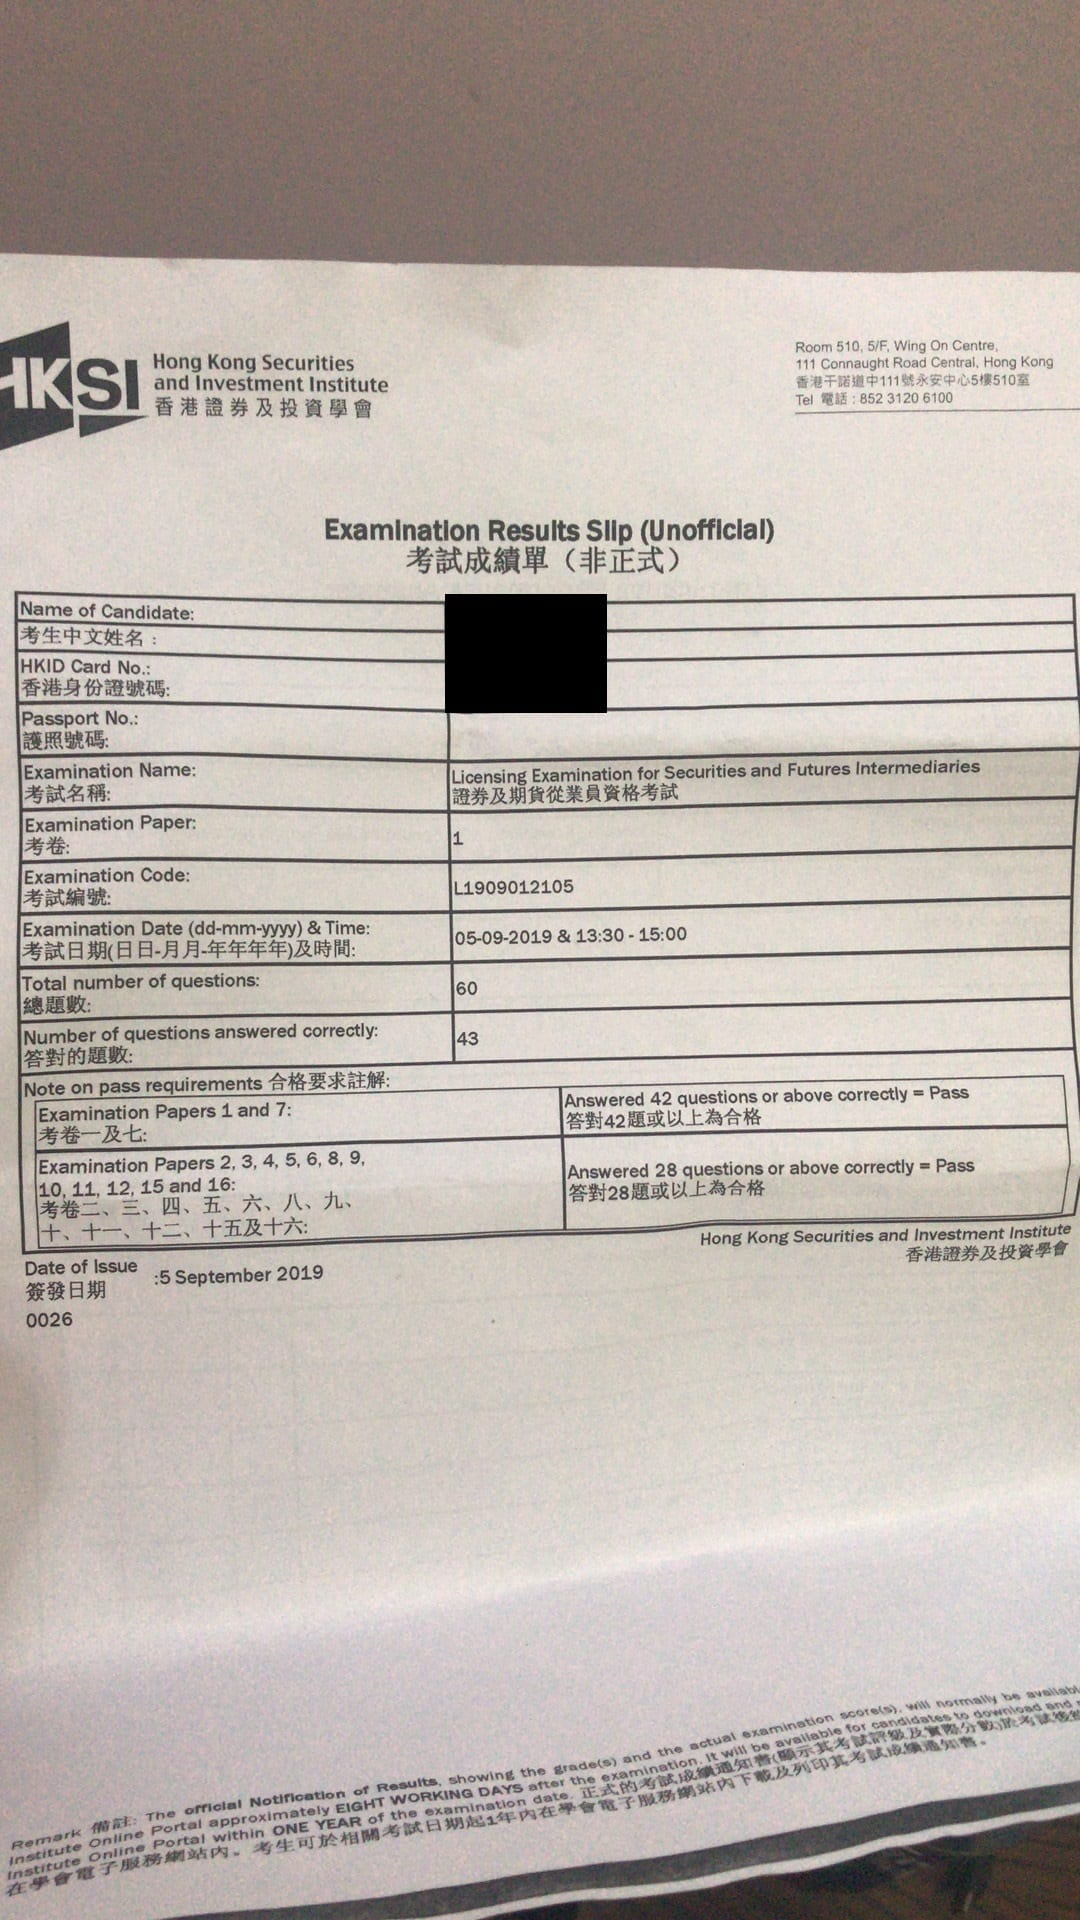 WHW 5/9/2019 LE Paper 1 證券期貨從業員資格考試卷一 Pass